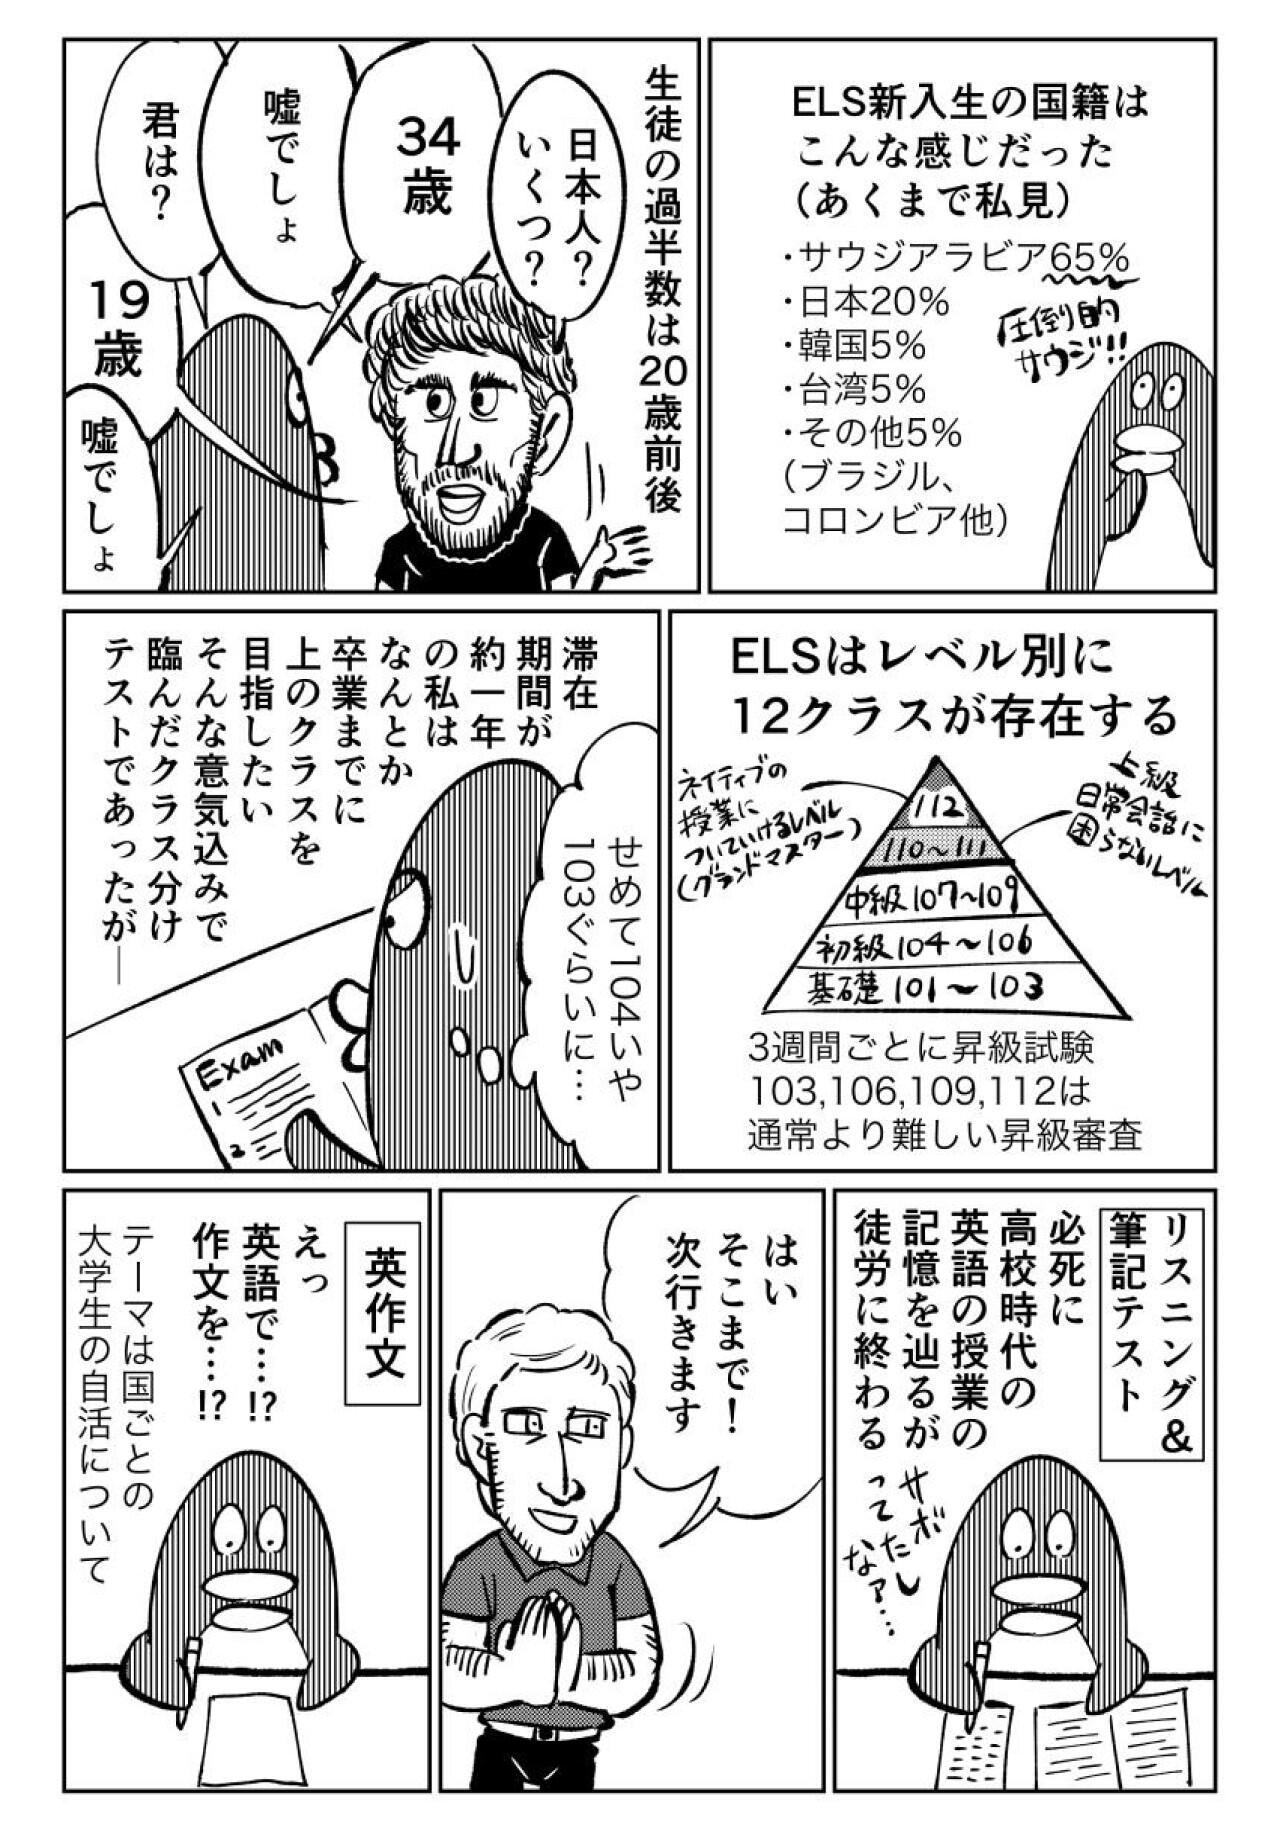 https://www.ryugaku.co.jp/column/images/34sai5_2_1280.jpg